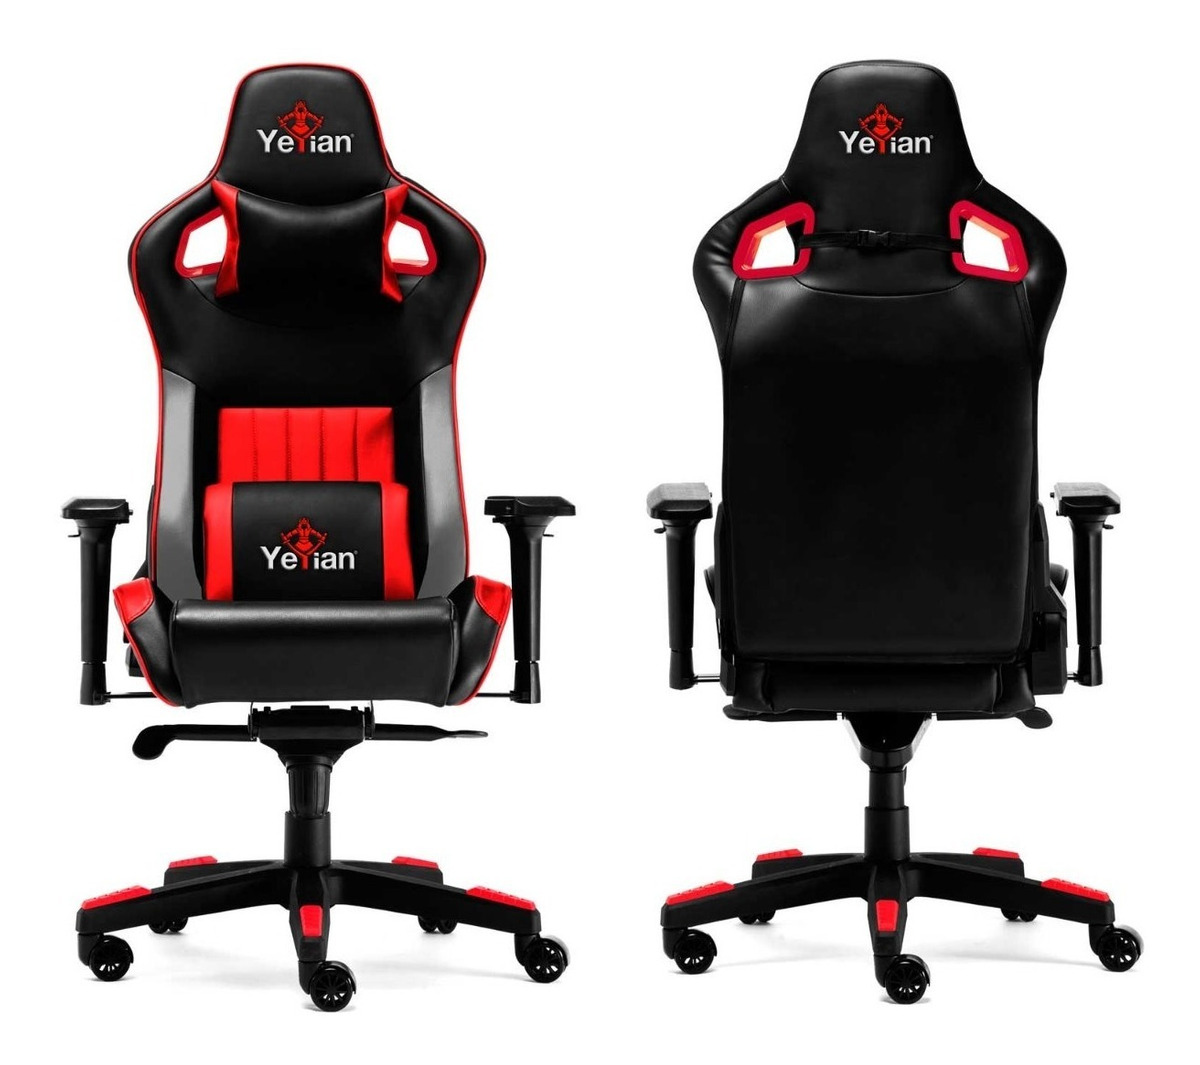 Silla Cadira Gamer Armazon Roja 2150r Yeyian Metalico rBhCQdsxt